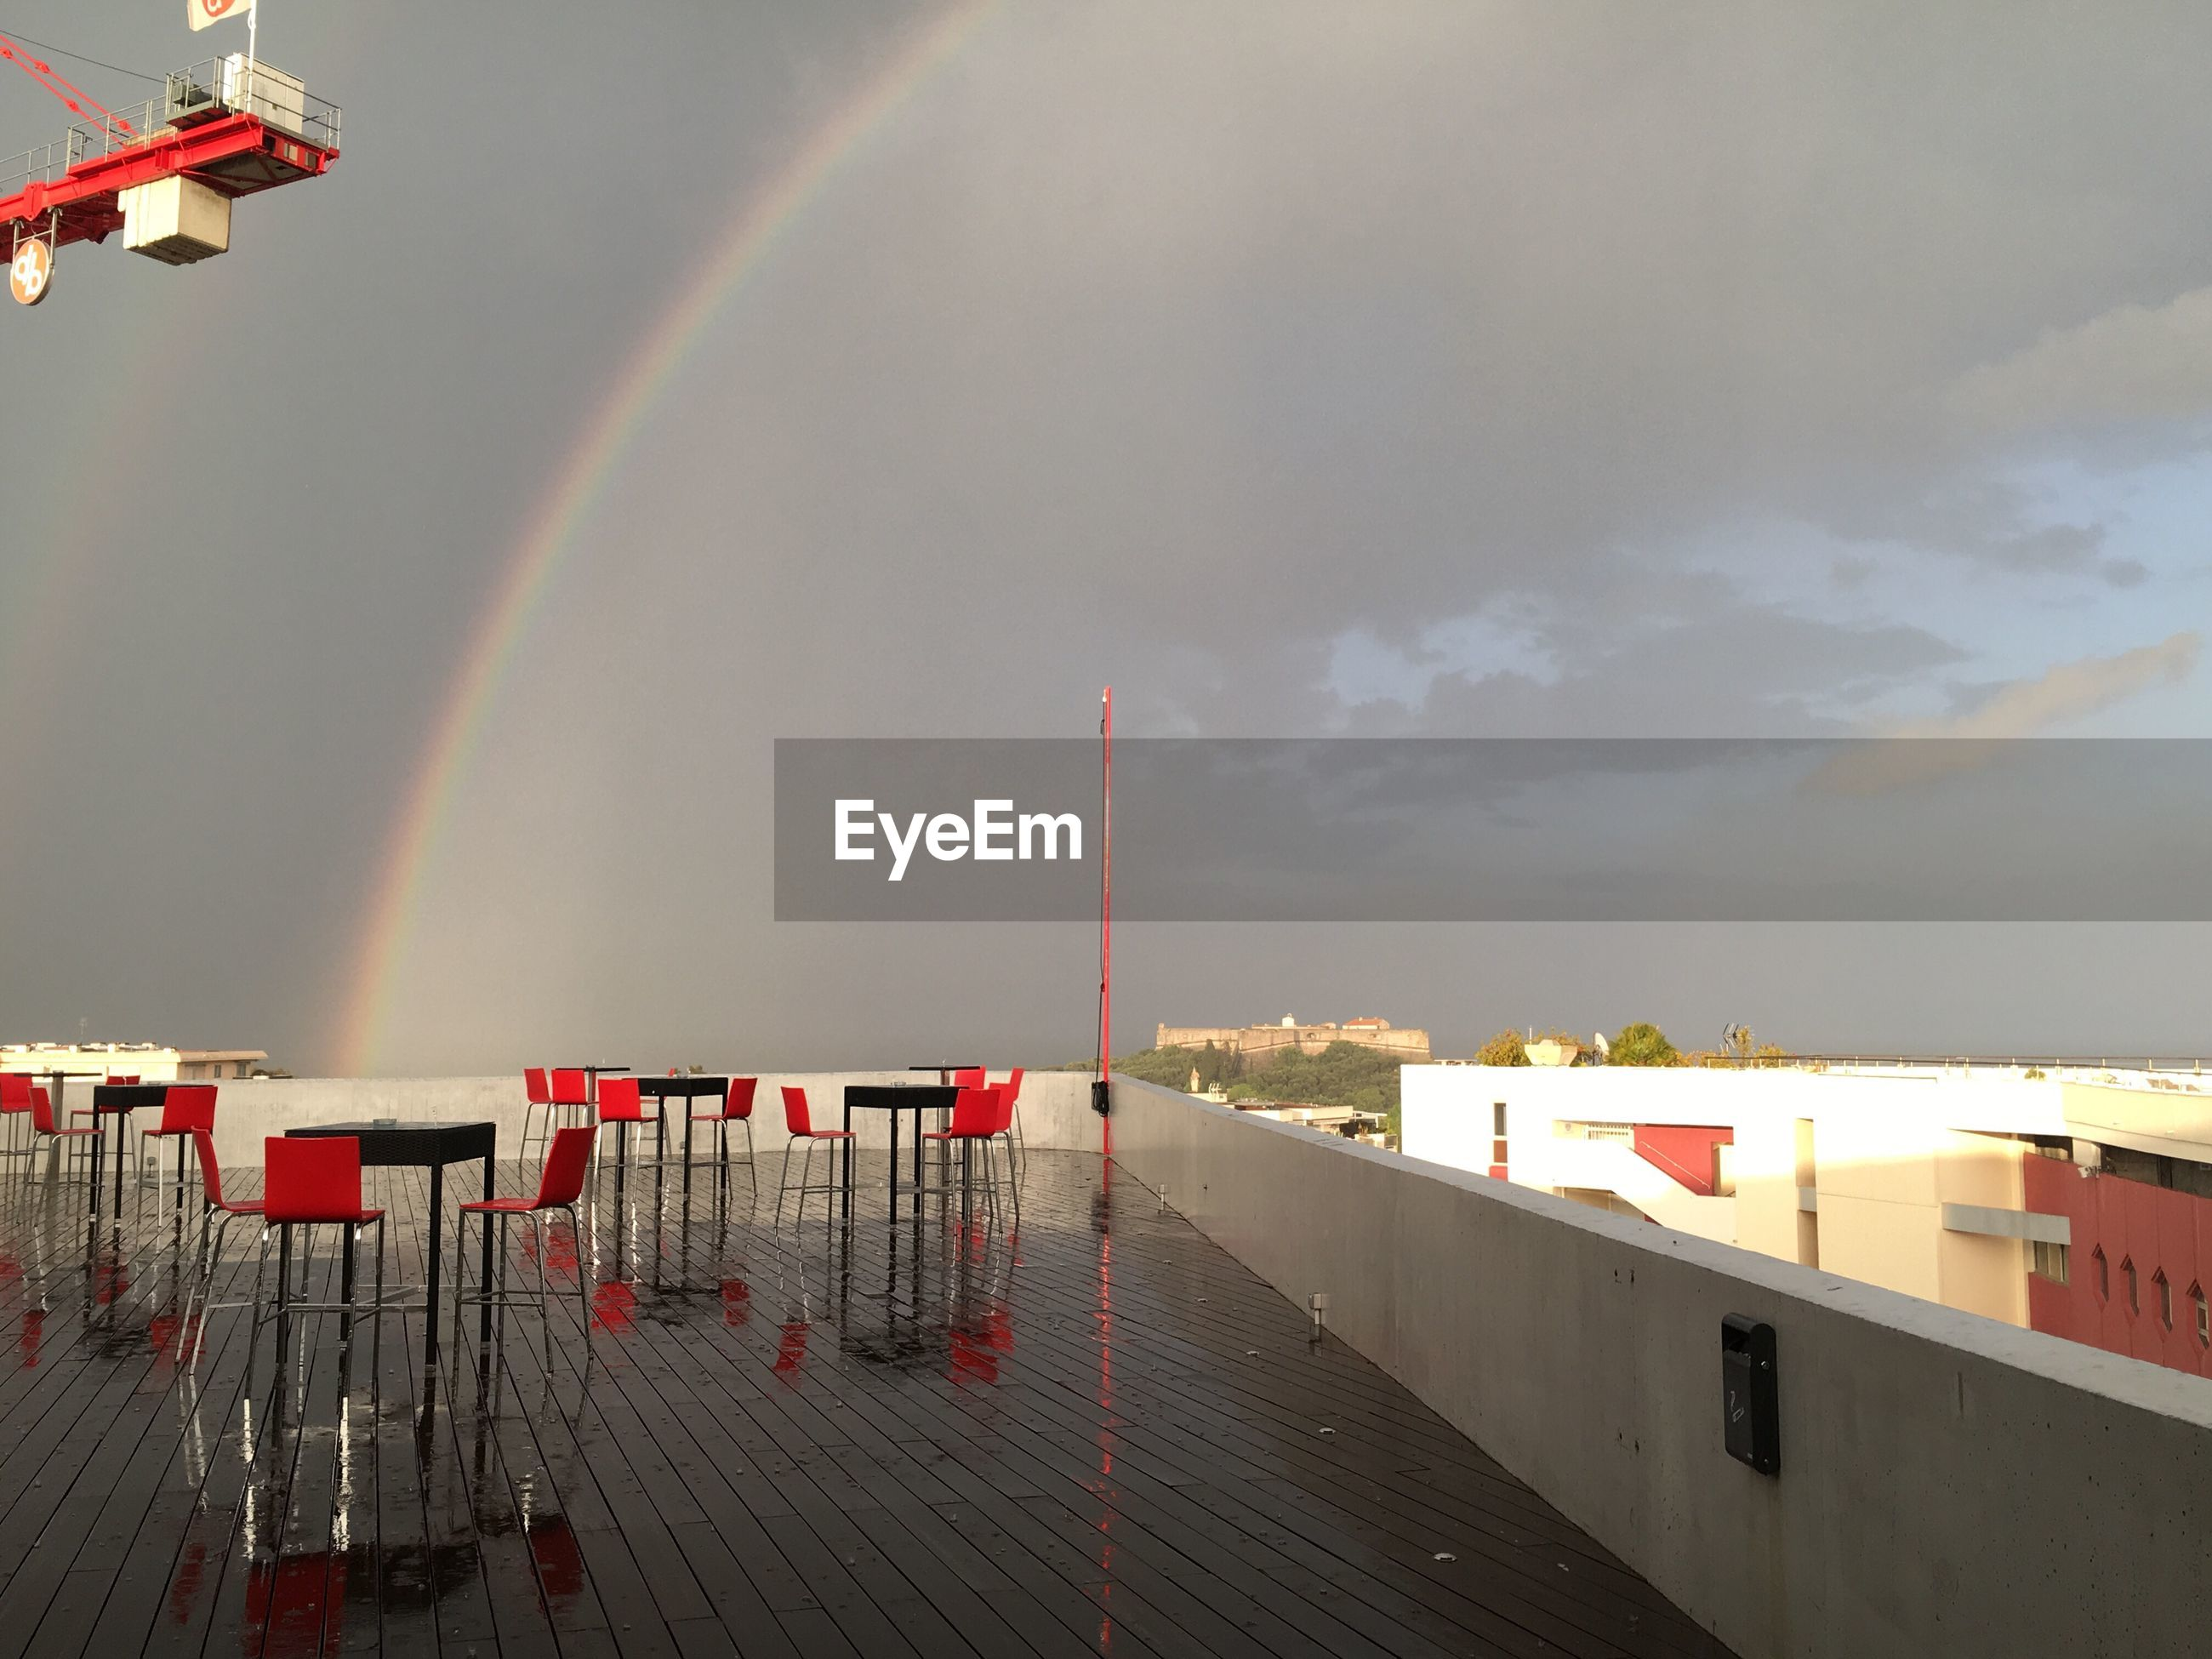 SCENIC VIEW OF RAINBOW OVER PIER